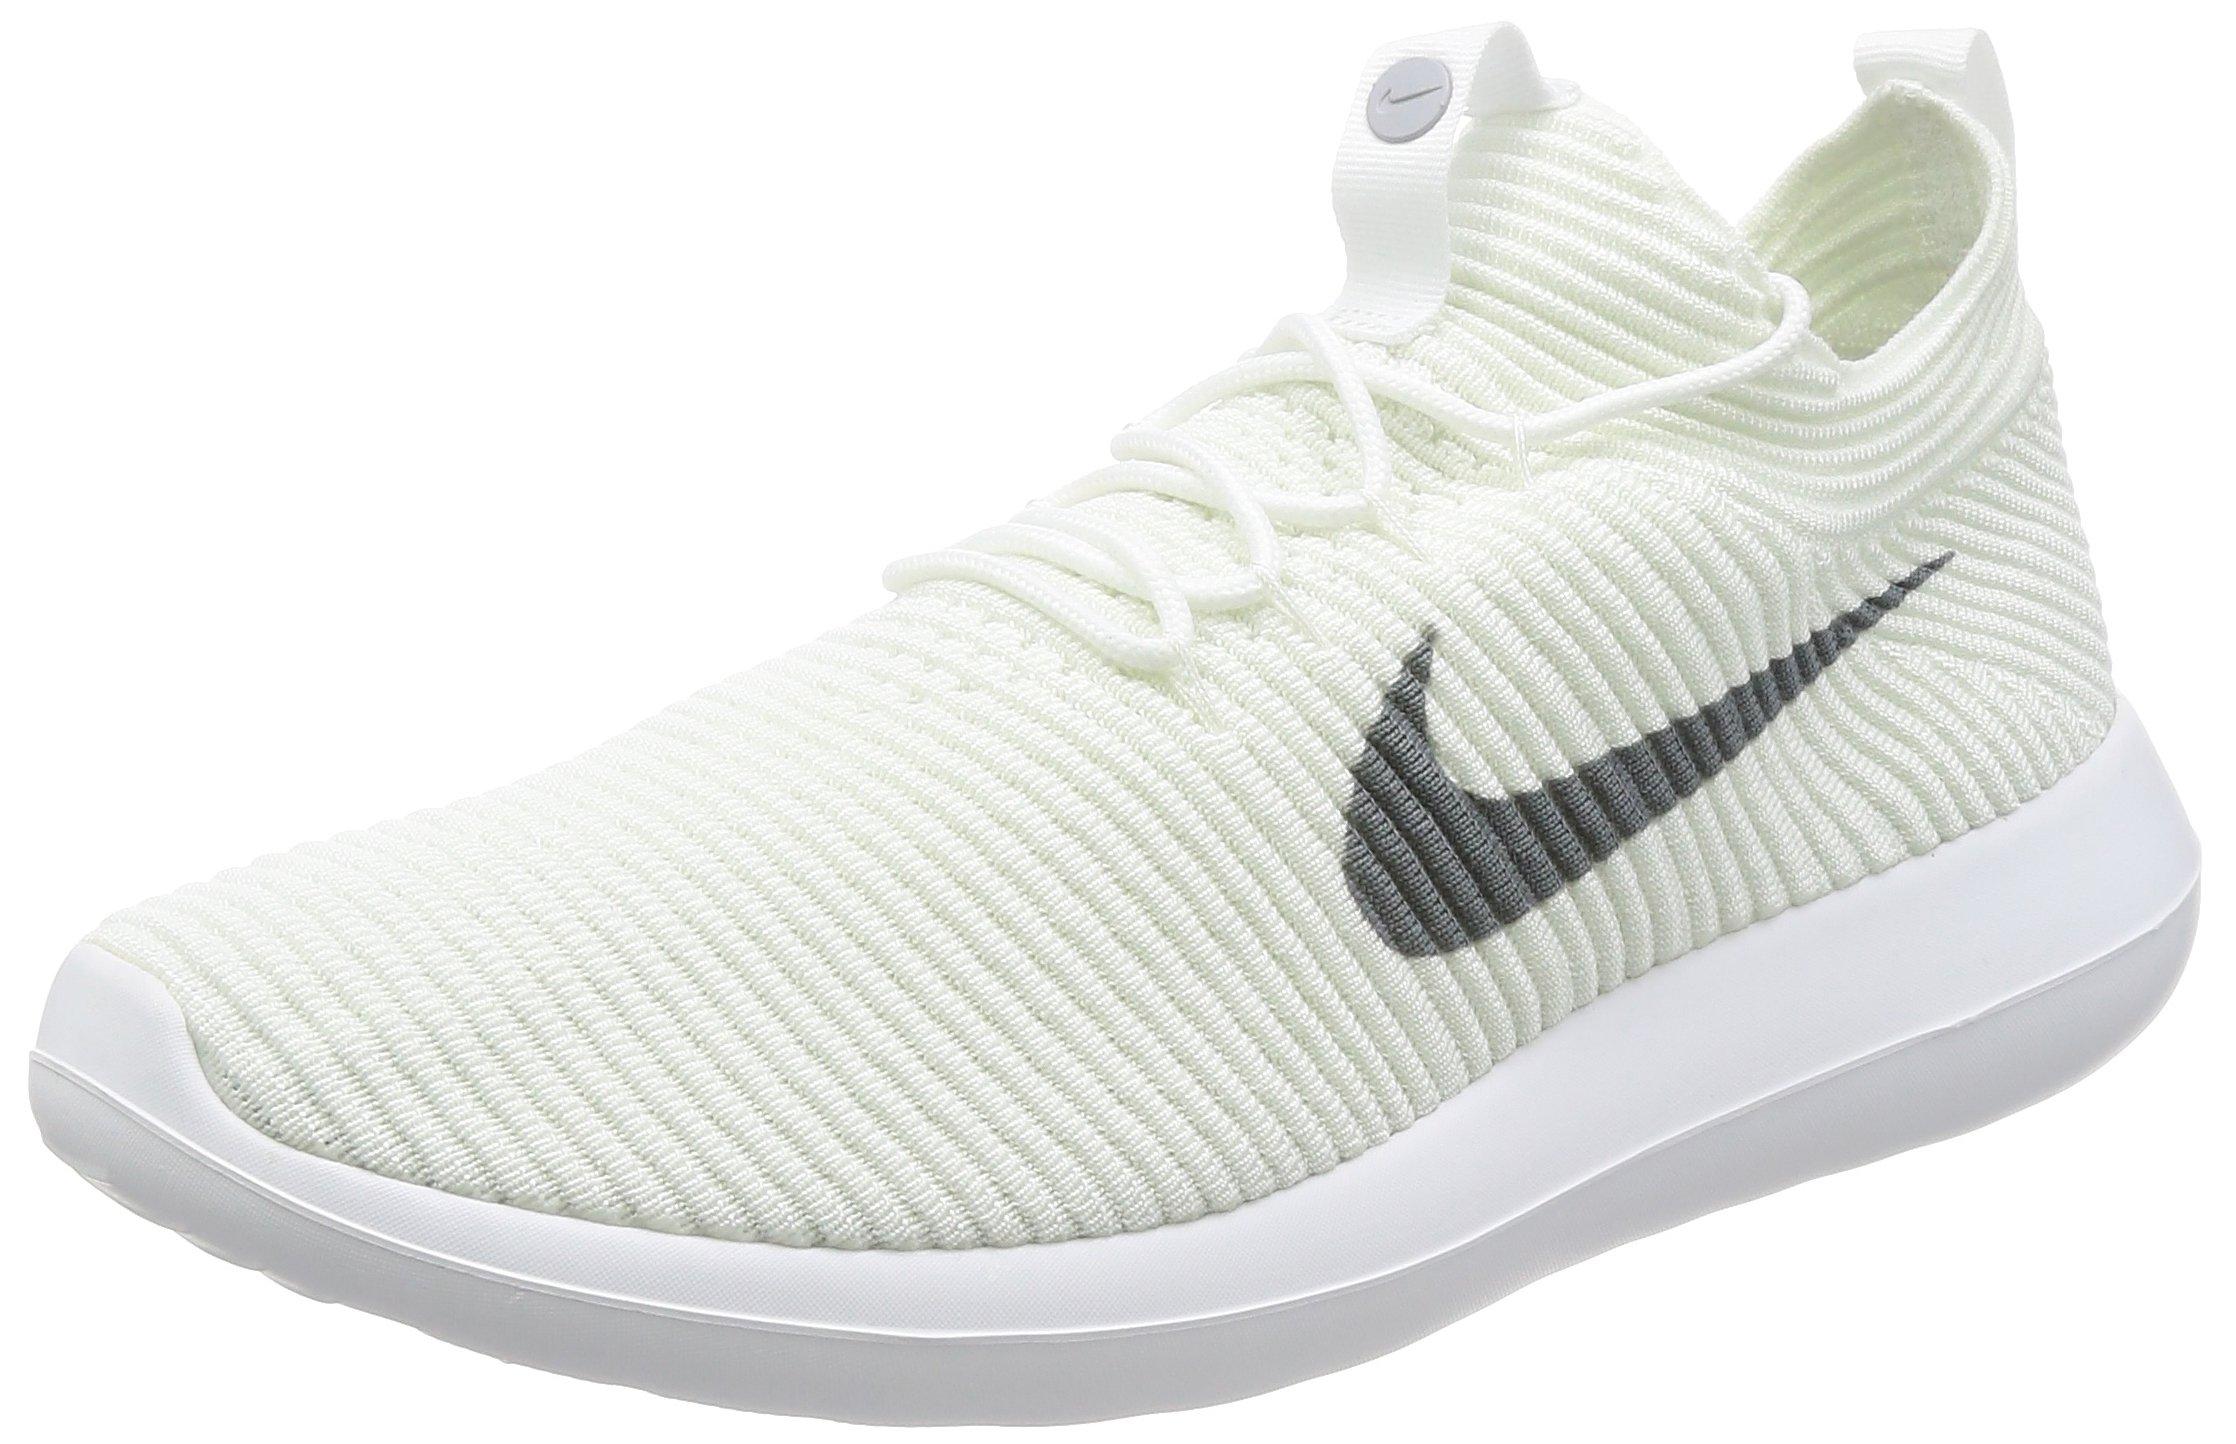 new arrival 315f2 9fee1 Galleon - Nike Roshe Two Flyknit V2 Mens Running Shoes (9 B(M) US)